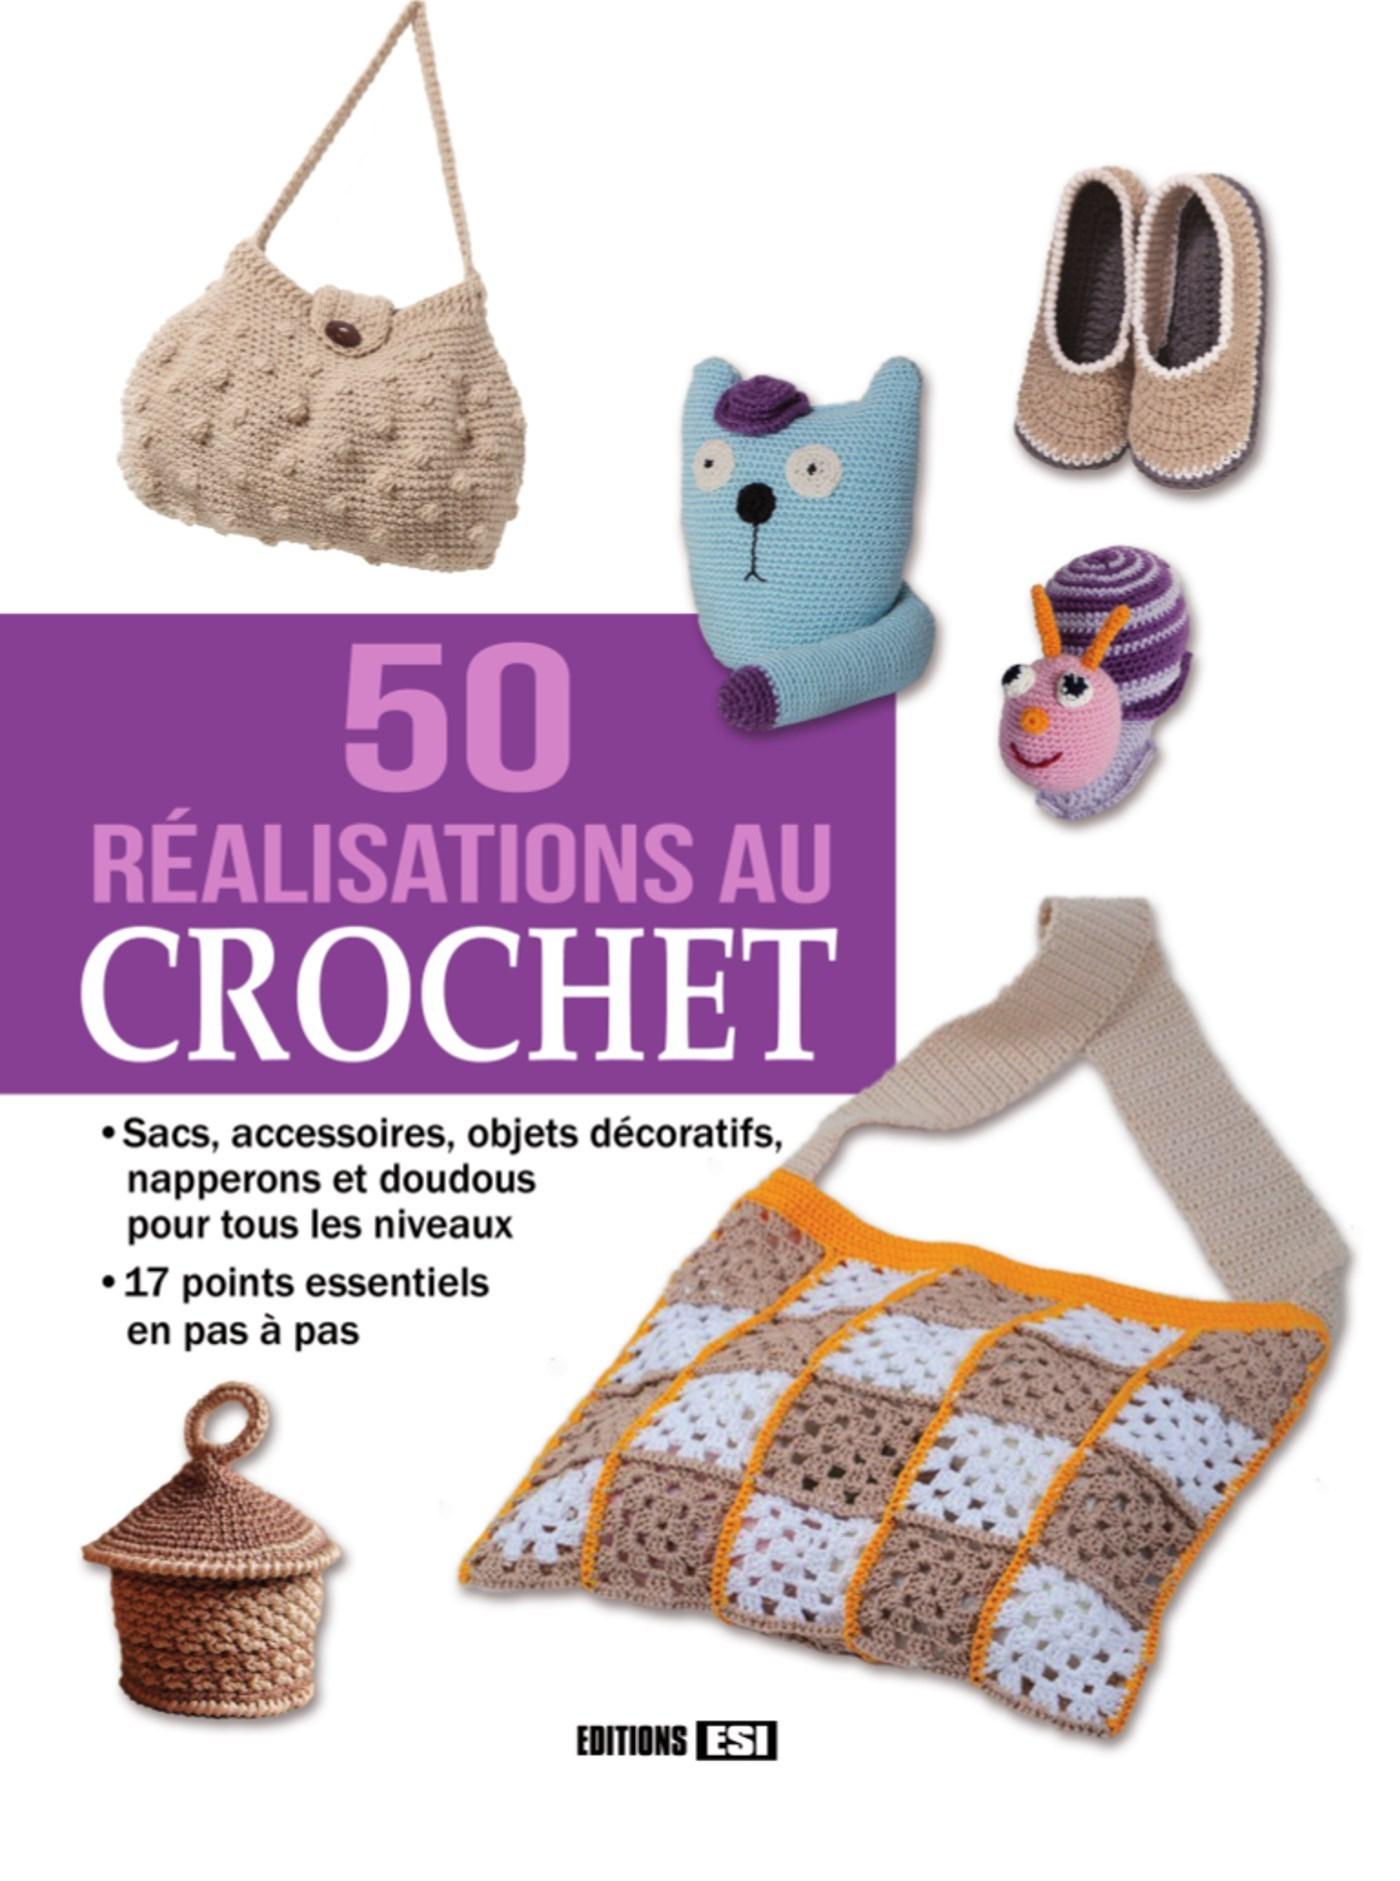 50 REALISATIONS AU CROCHET